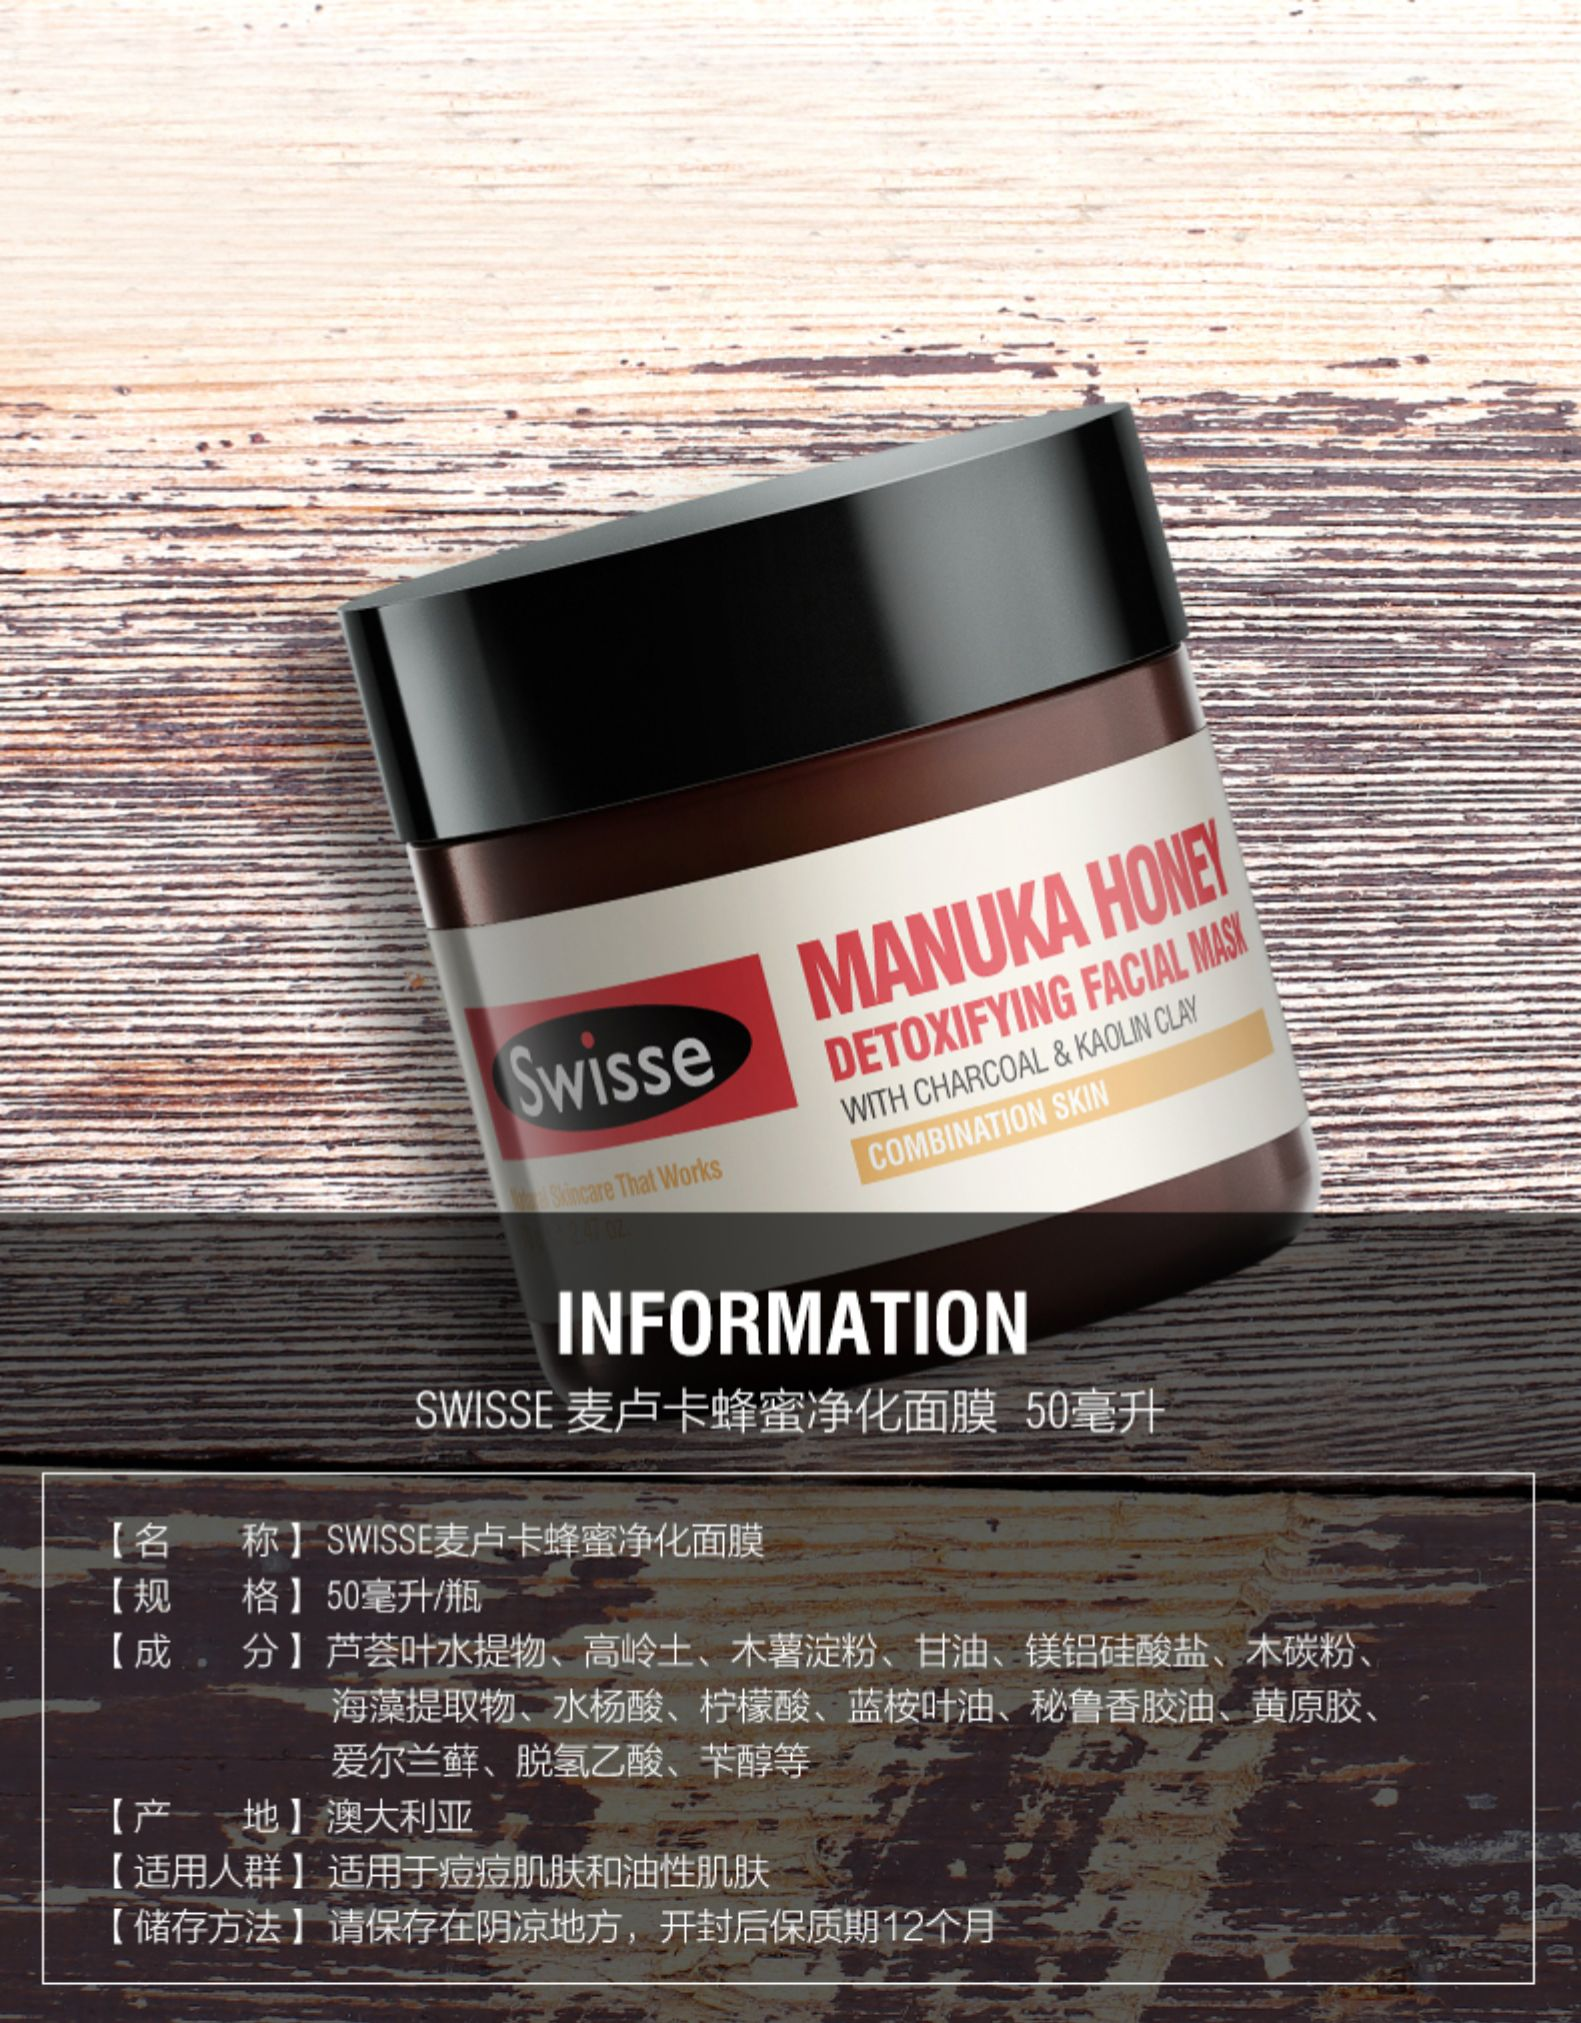 swisse澳洲进口麦卢卡蜂蜜面膜70g 深层清洁滋润面膜 我们的产品 第6张